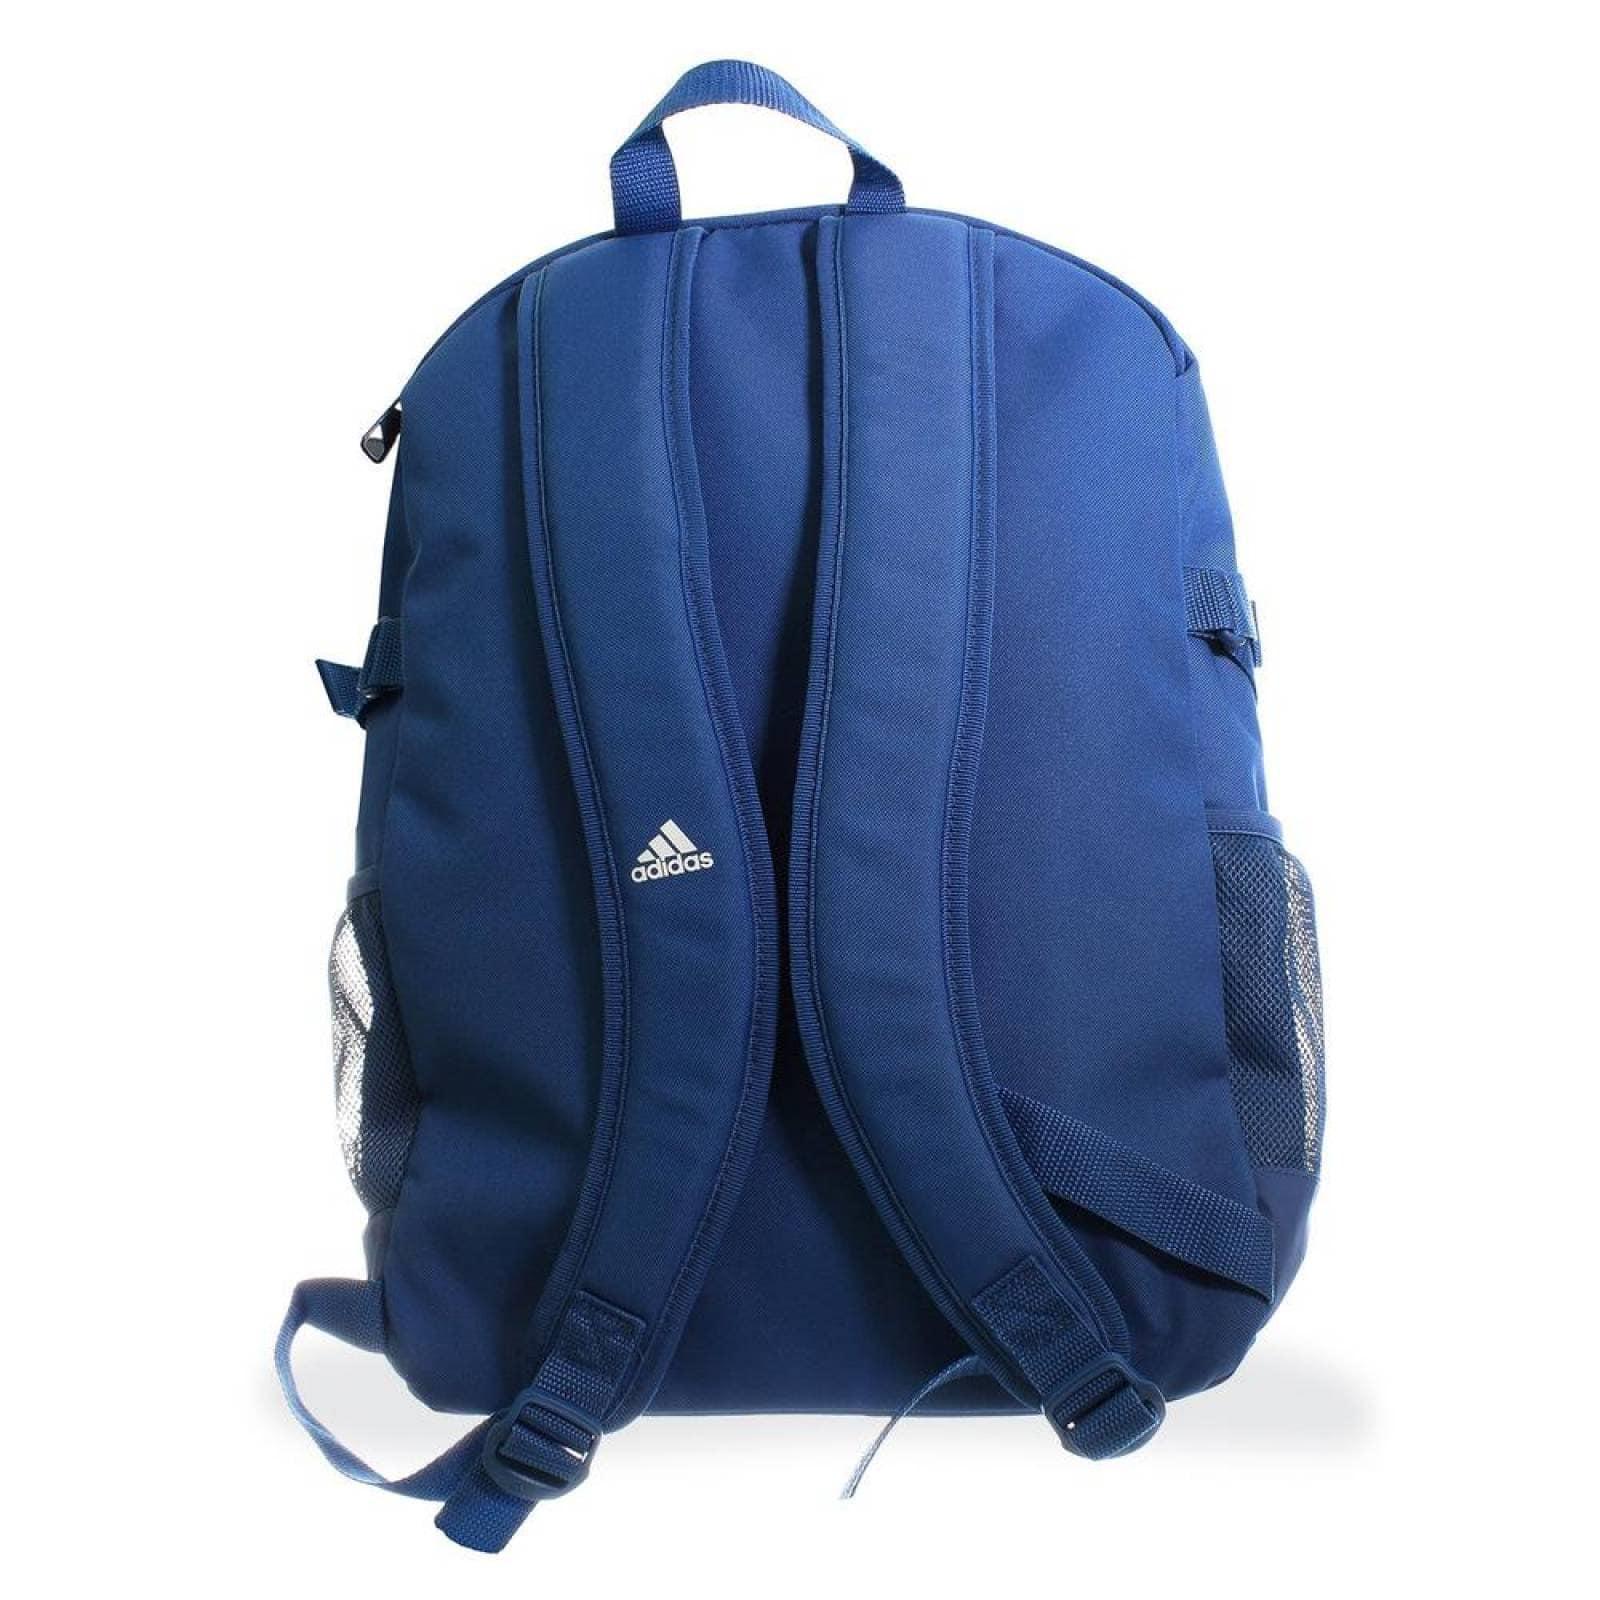 Iv Unisex Brillante Adidas Azul Power Mochila Dm7684 F1JKuTc3l